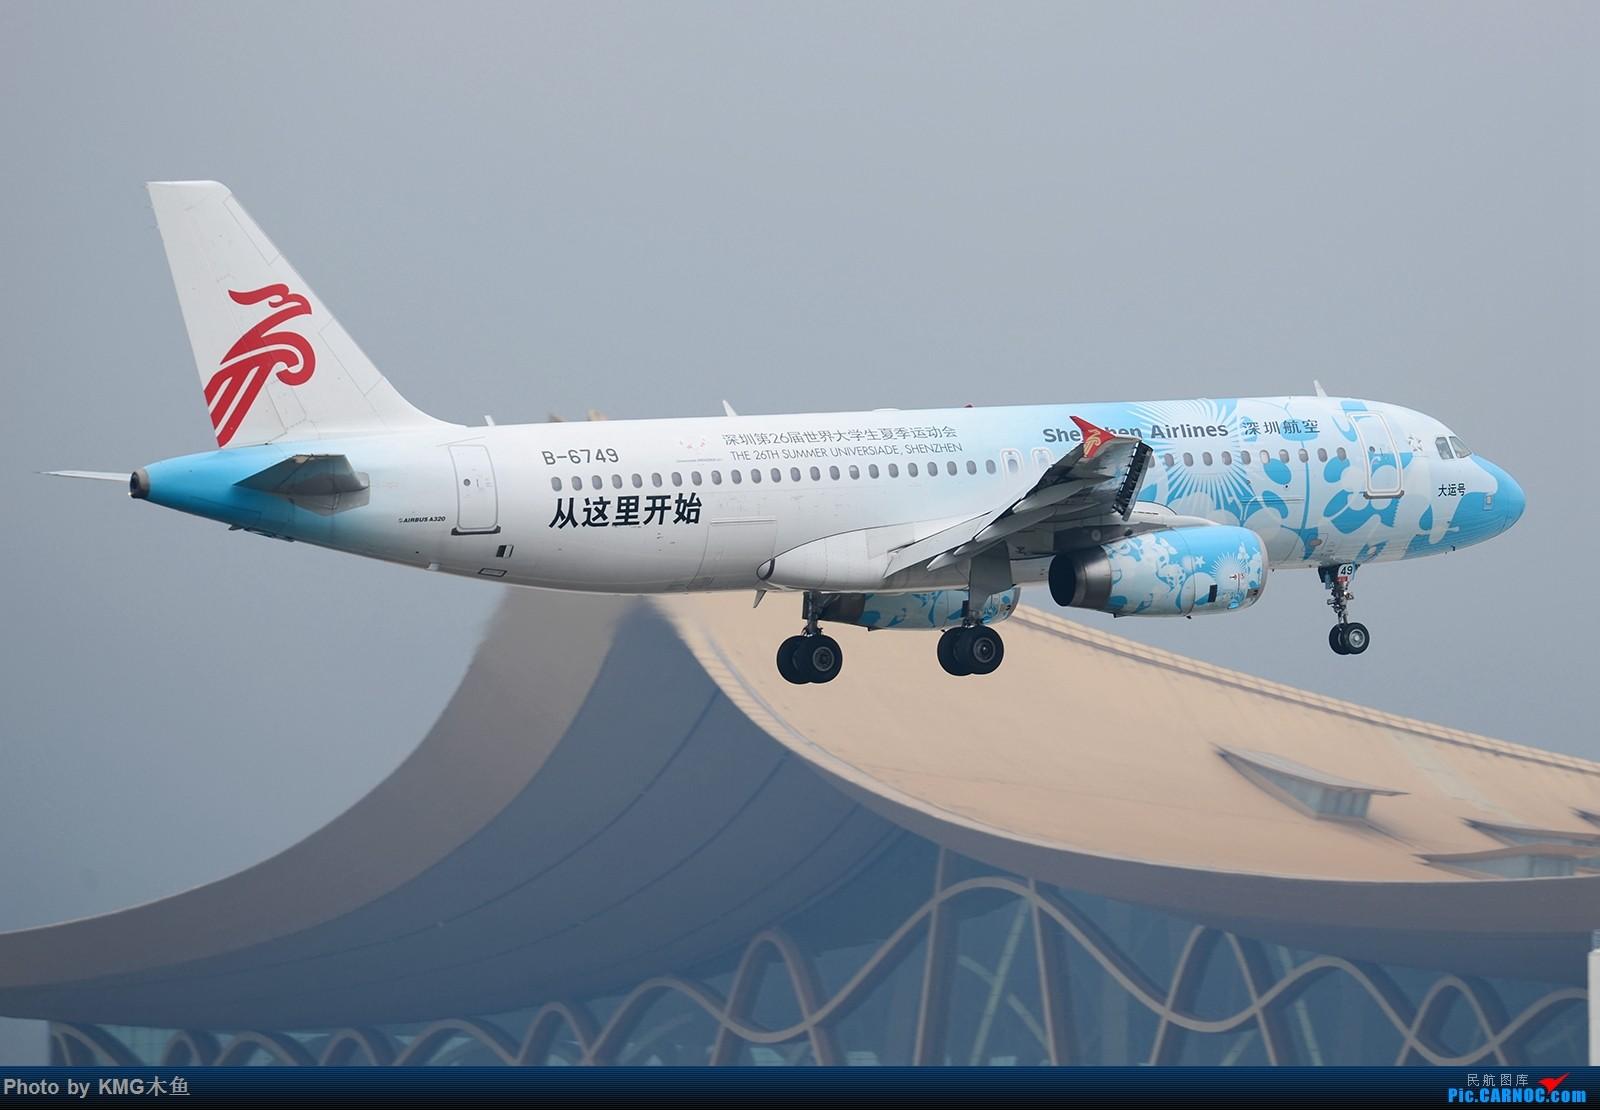 Re:[原创]【昆明长水国际机场——KMG木鱼拍机】昆明接二连三的阴雨天,形成了好货烂天有,烂天必有好货的奇特现象 AIRBUS A320-200 B-6749 中国昆明长水国际机场